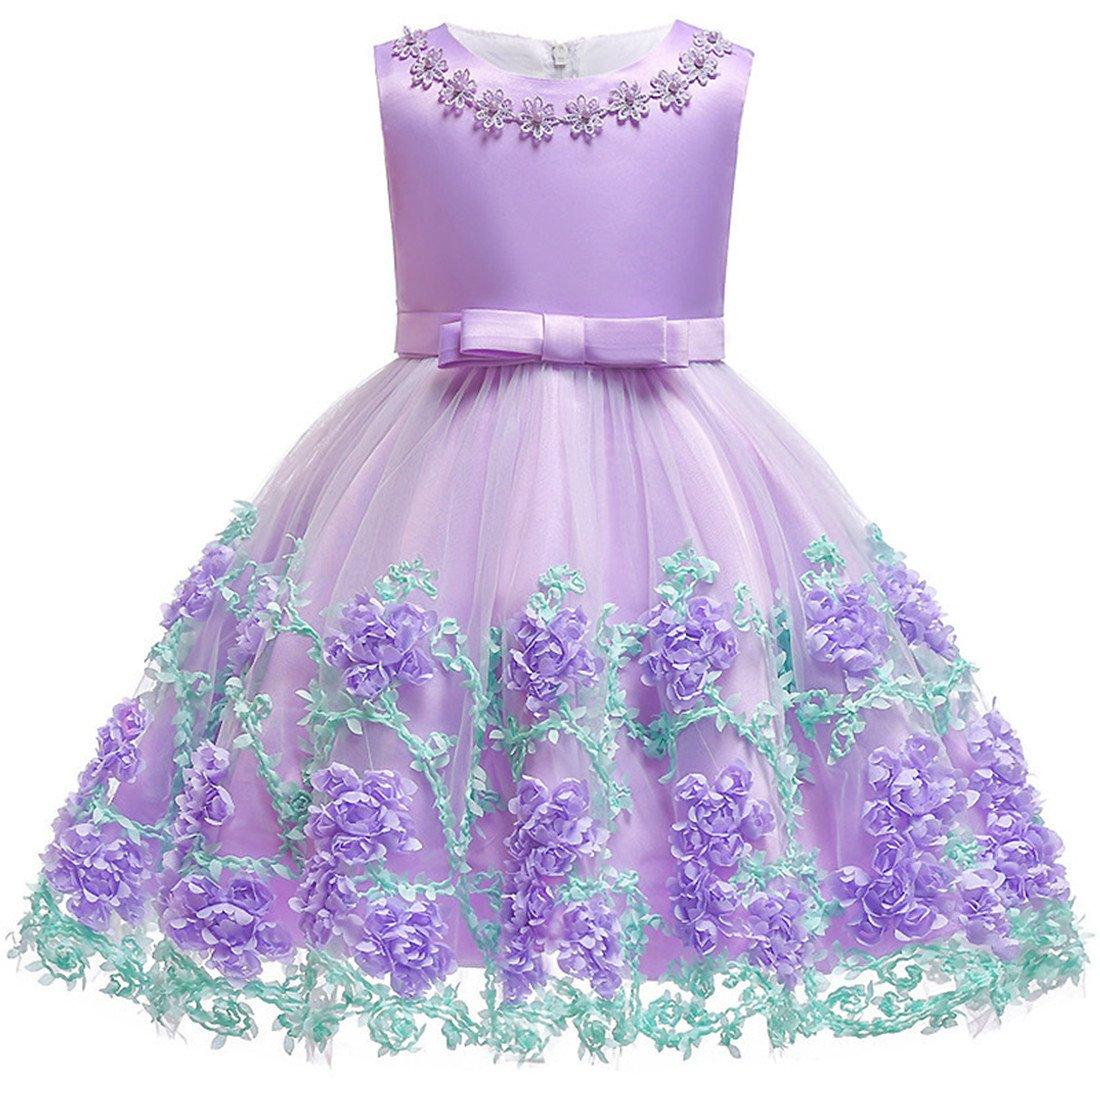 Summer Dresses 12-18 Month Easter Purple Tutu Dress for Wedding Birthday Party Toddler Kids Sleeveless Flower Dress baptism dresses for baby girls 12 Month Infant Cute Princess Dress (Lavender 12M)